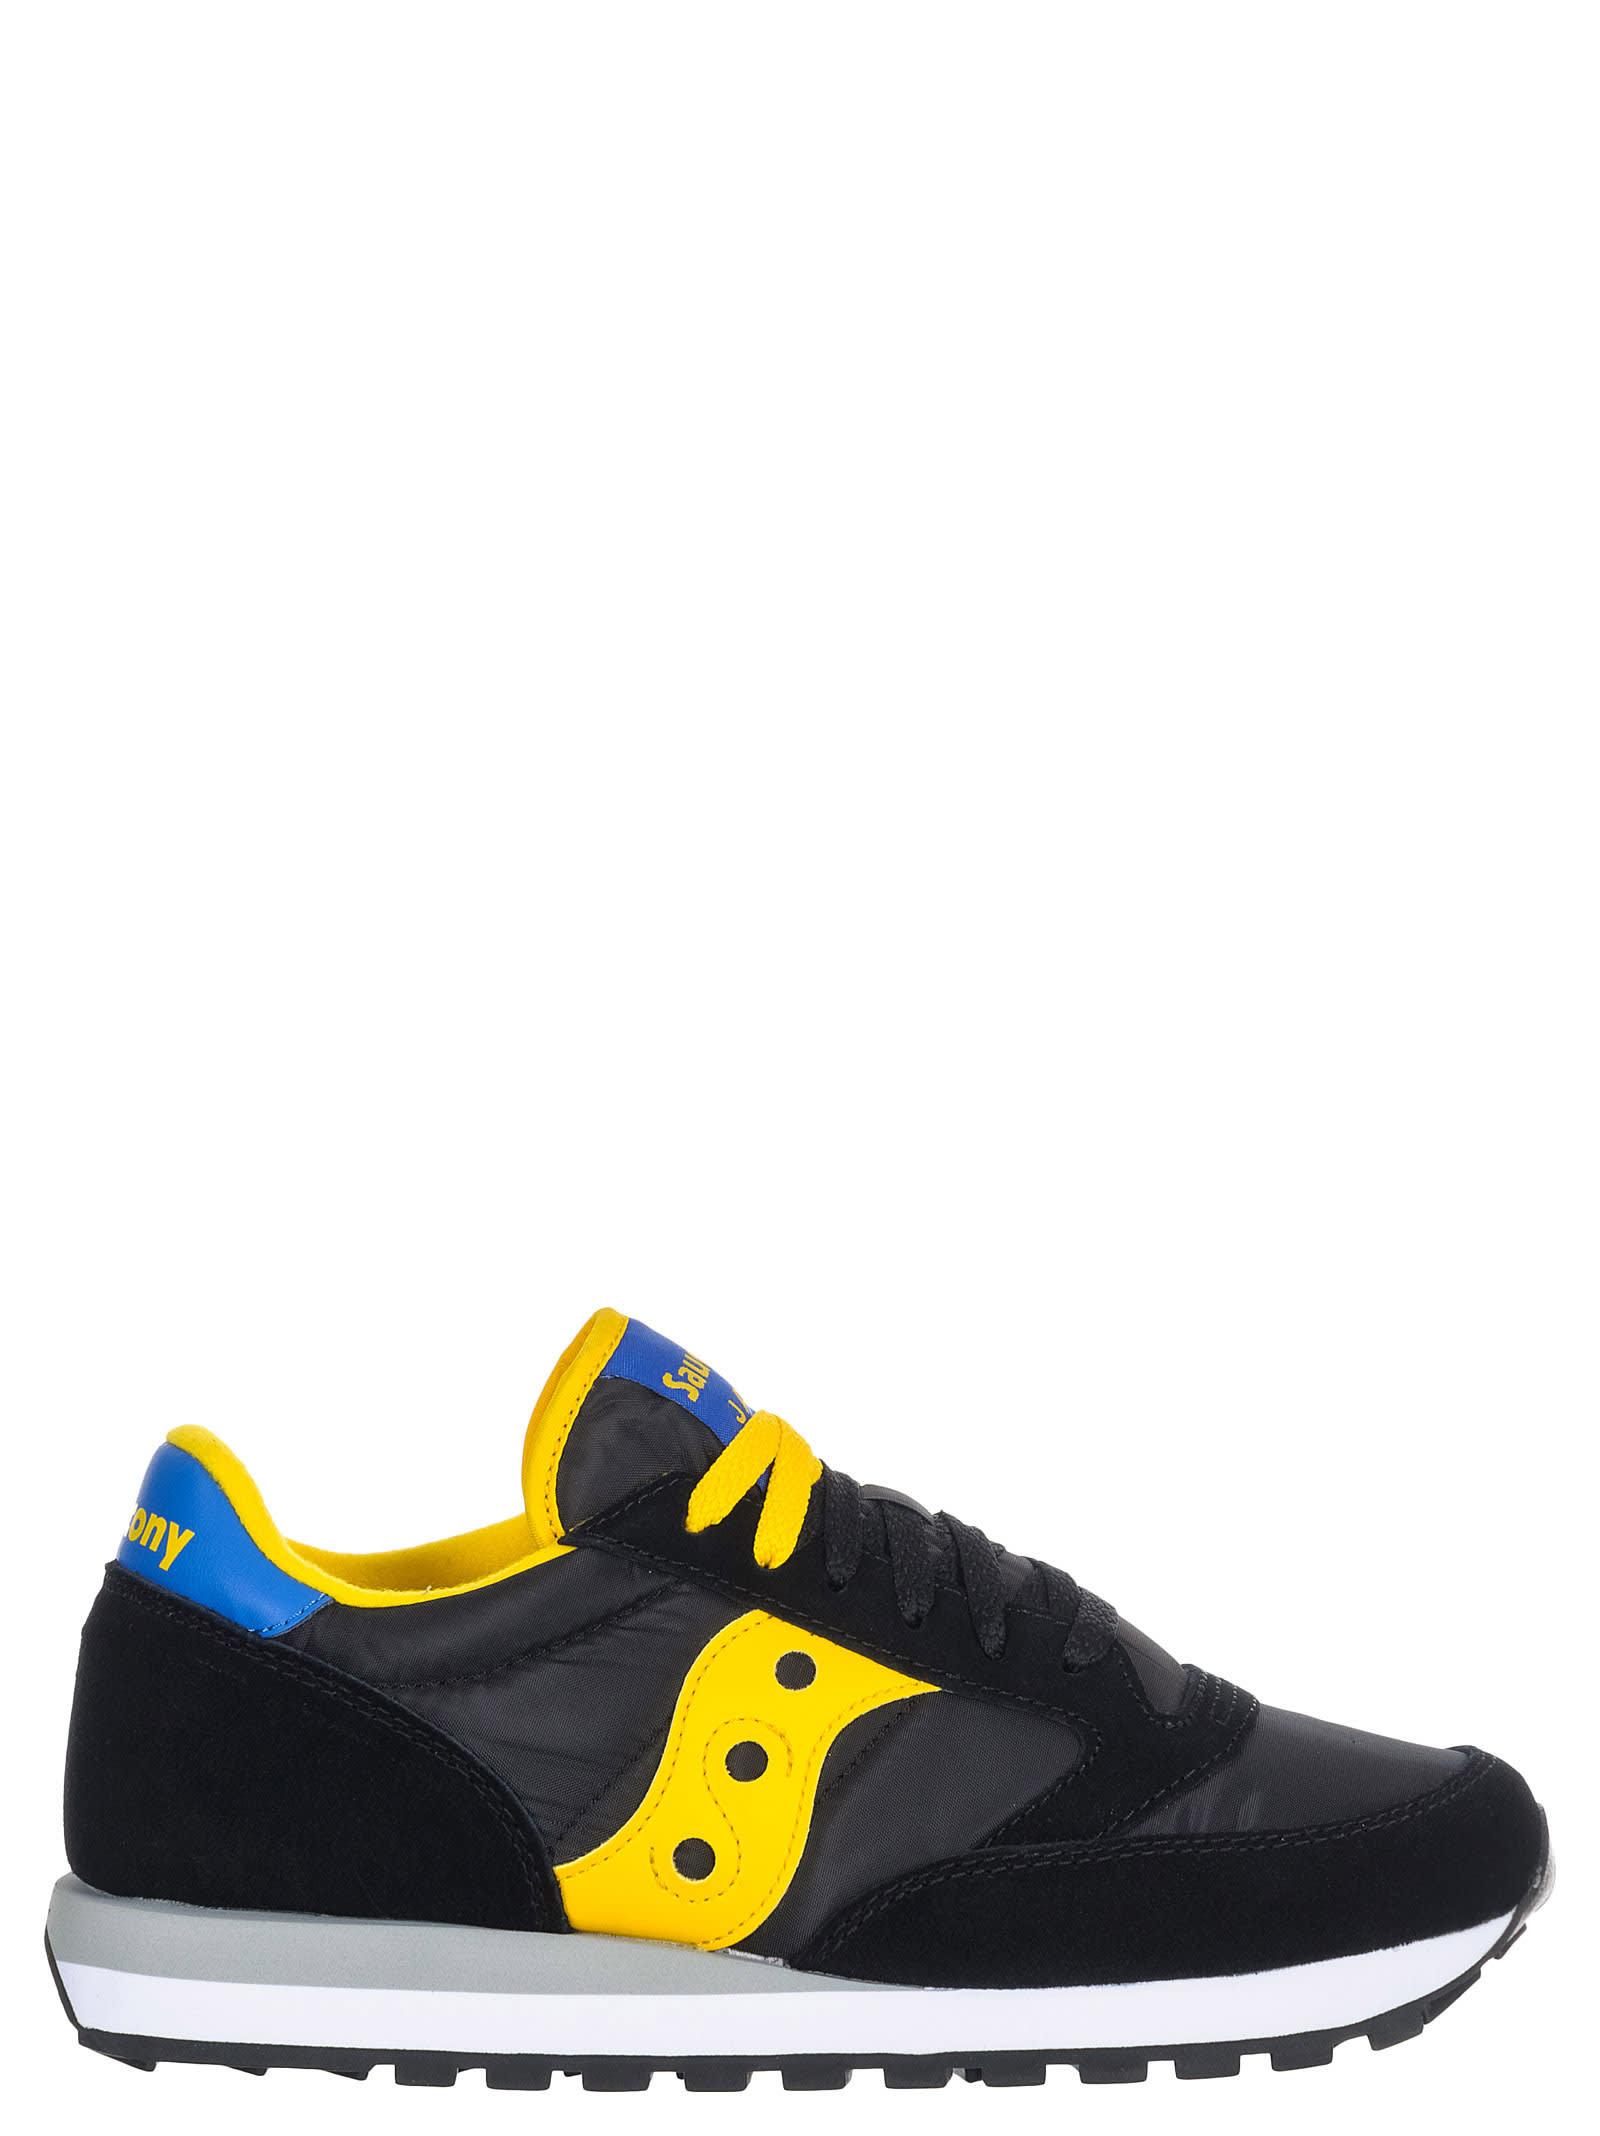 Best price on the market at italist | Saucony Saucony Jazz Blackyellowblue Sneakers